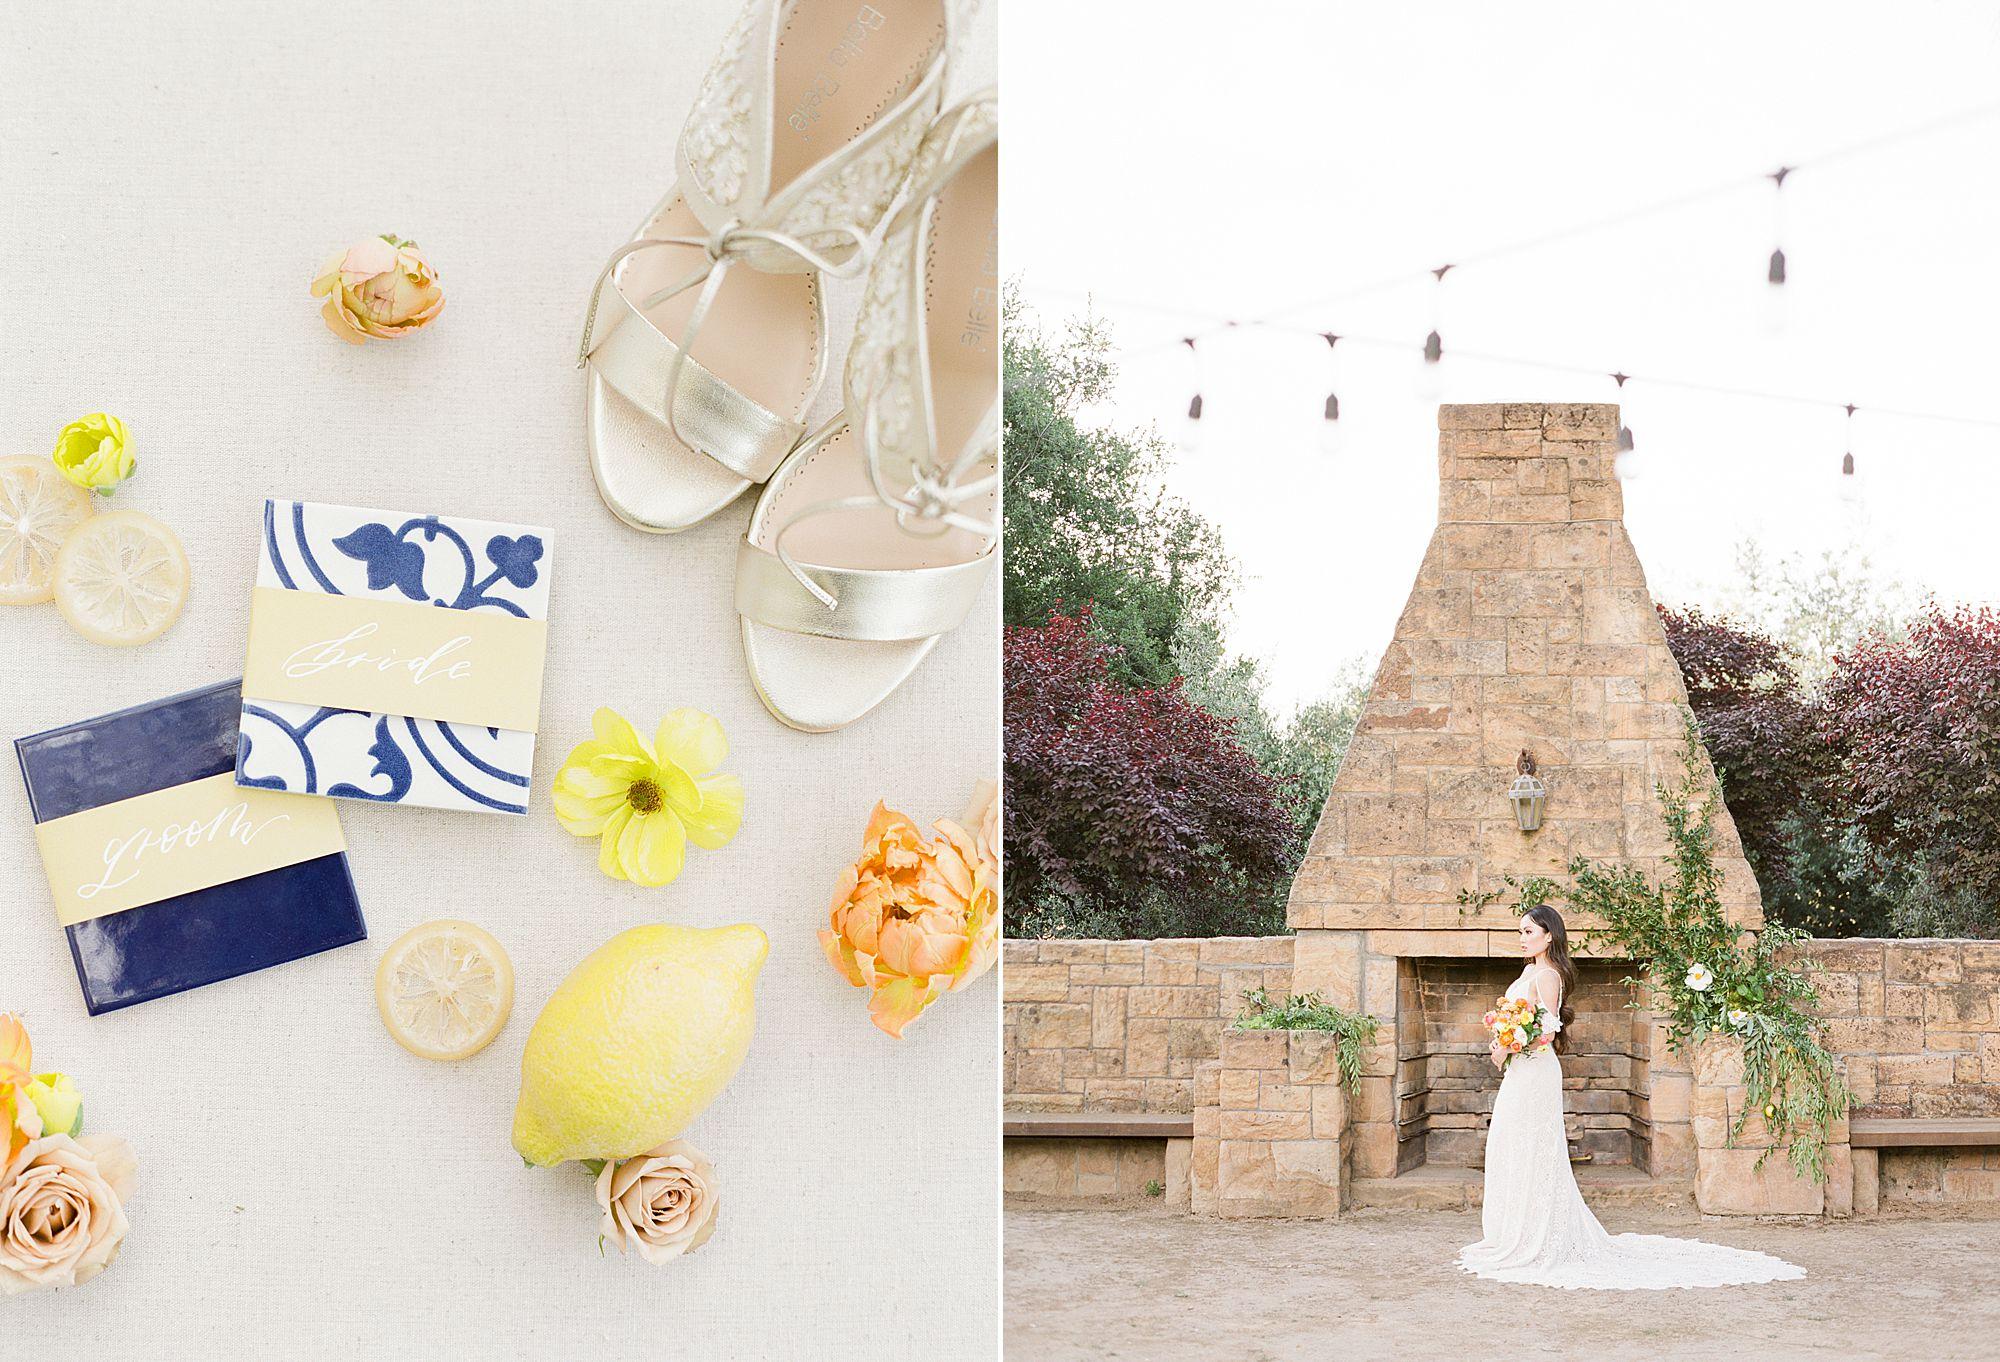 Italian Wedding Inspiration at The Maples Wedding & Event Center - Featured on Wedding Chicks - Ashley Baumgartner - Sacramento Wedding Phtoographer_0020.jpg